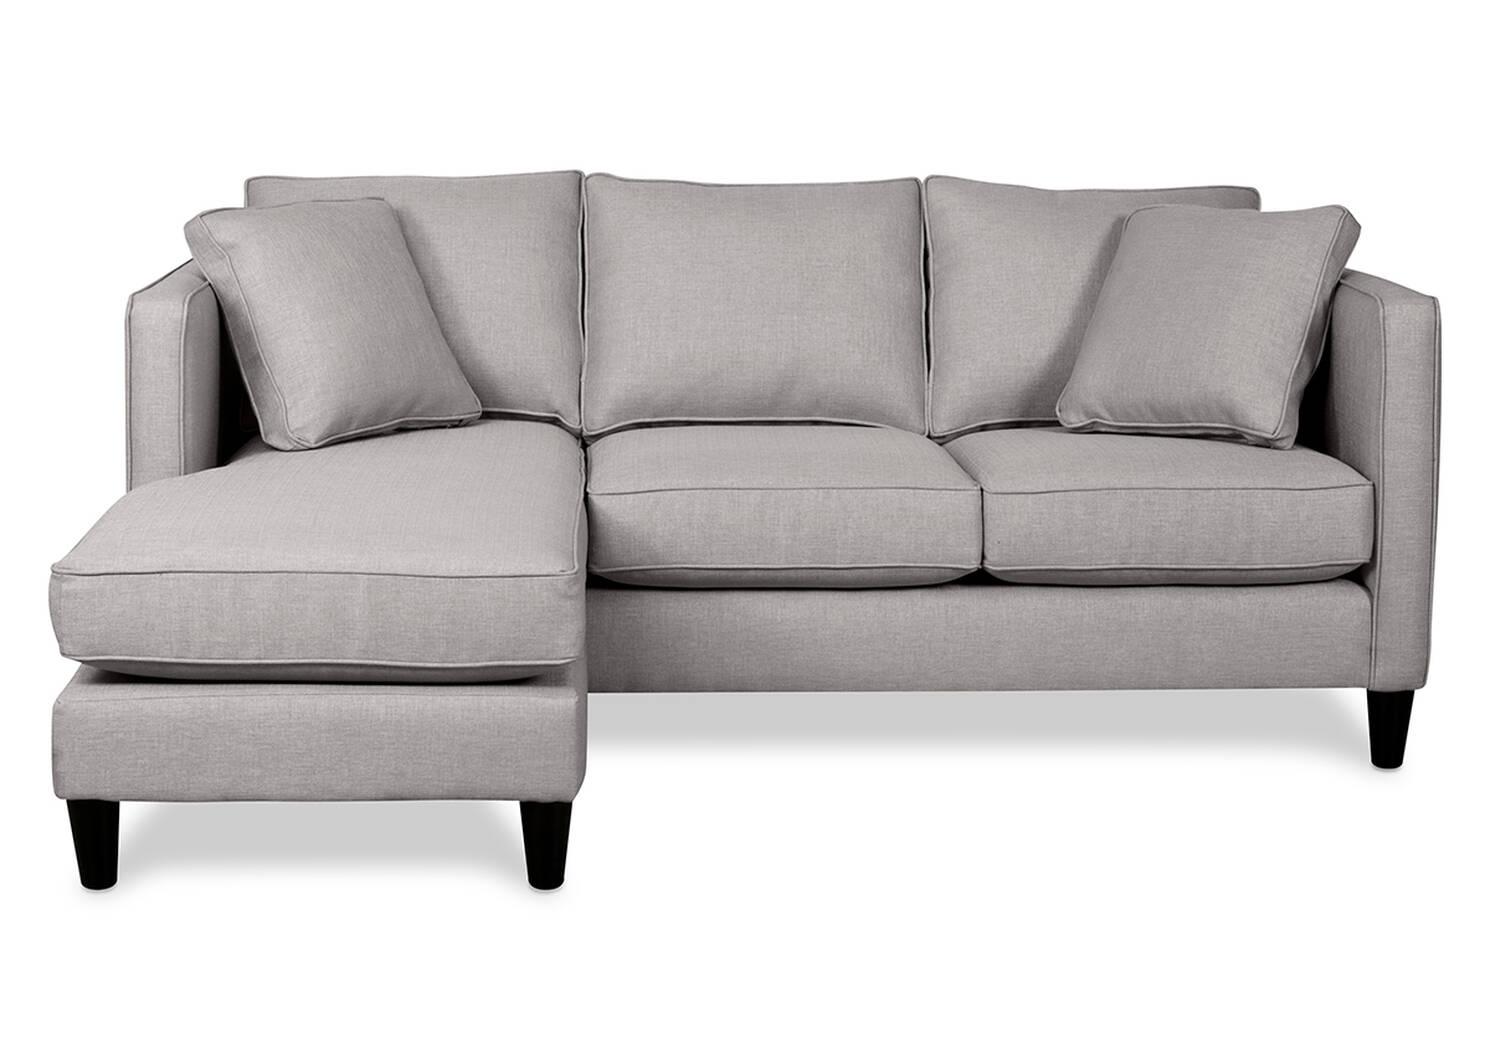 Lure Custom Sofa Chaise